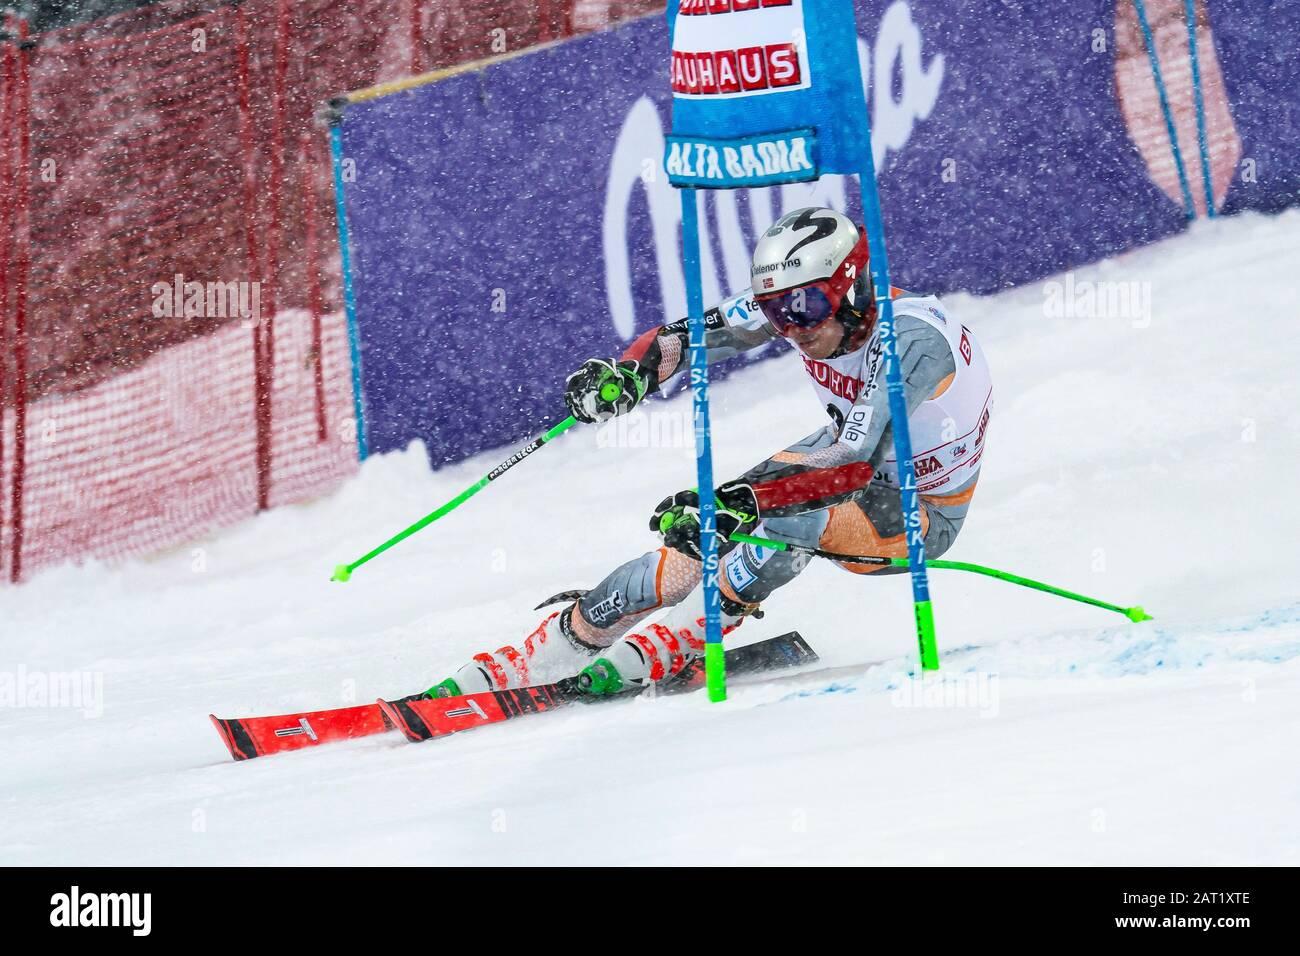 Alta Badia, Italy 22 December 2019.  KRISTOFFERSEN Henrik (Nor) competing in the Audi Fis Alpine Skiing World Cup Men's Giant Slalom on the Gran Risa Stock Photo